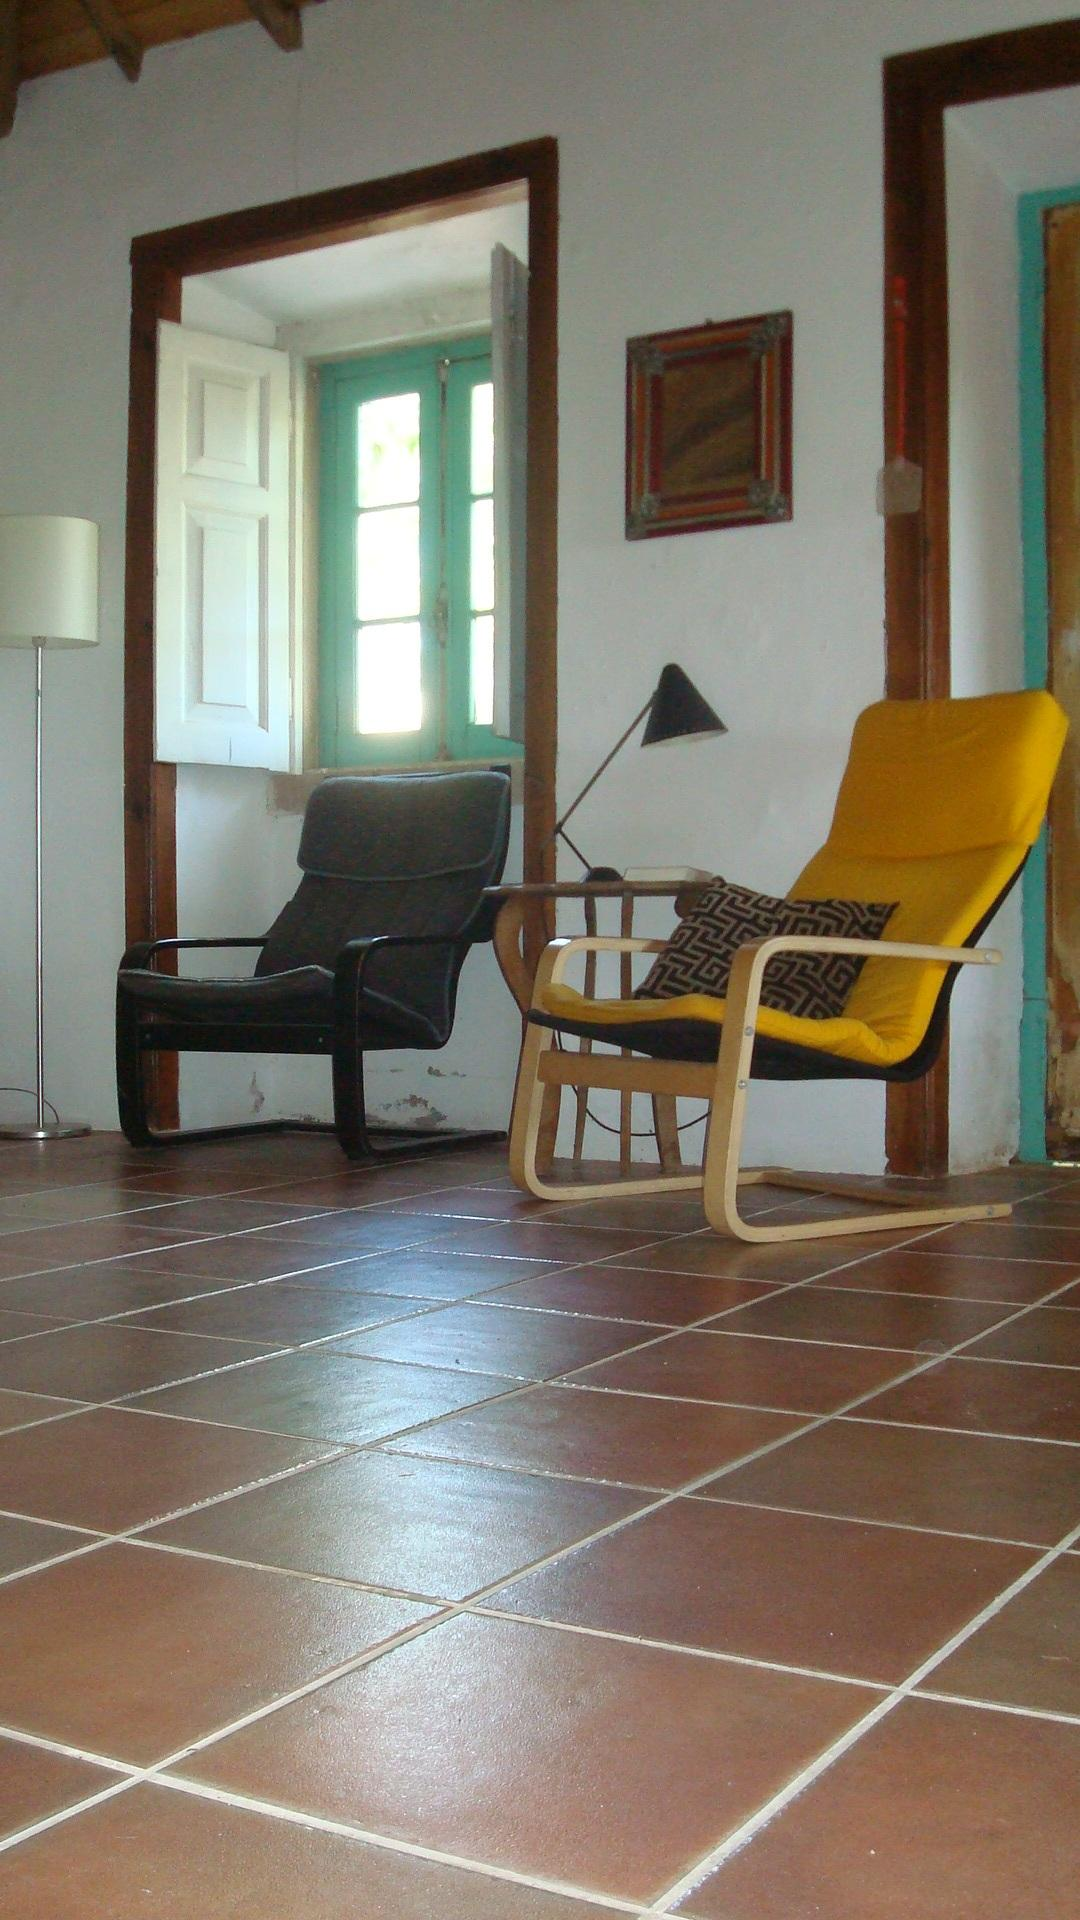 Huiskamer Balanchinho